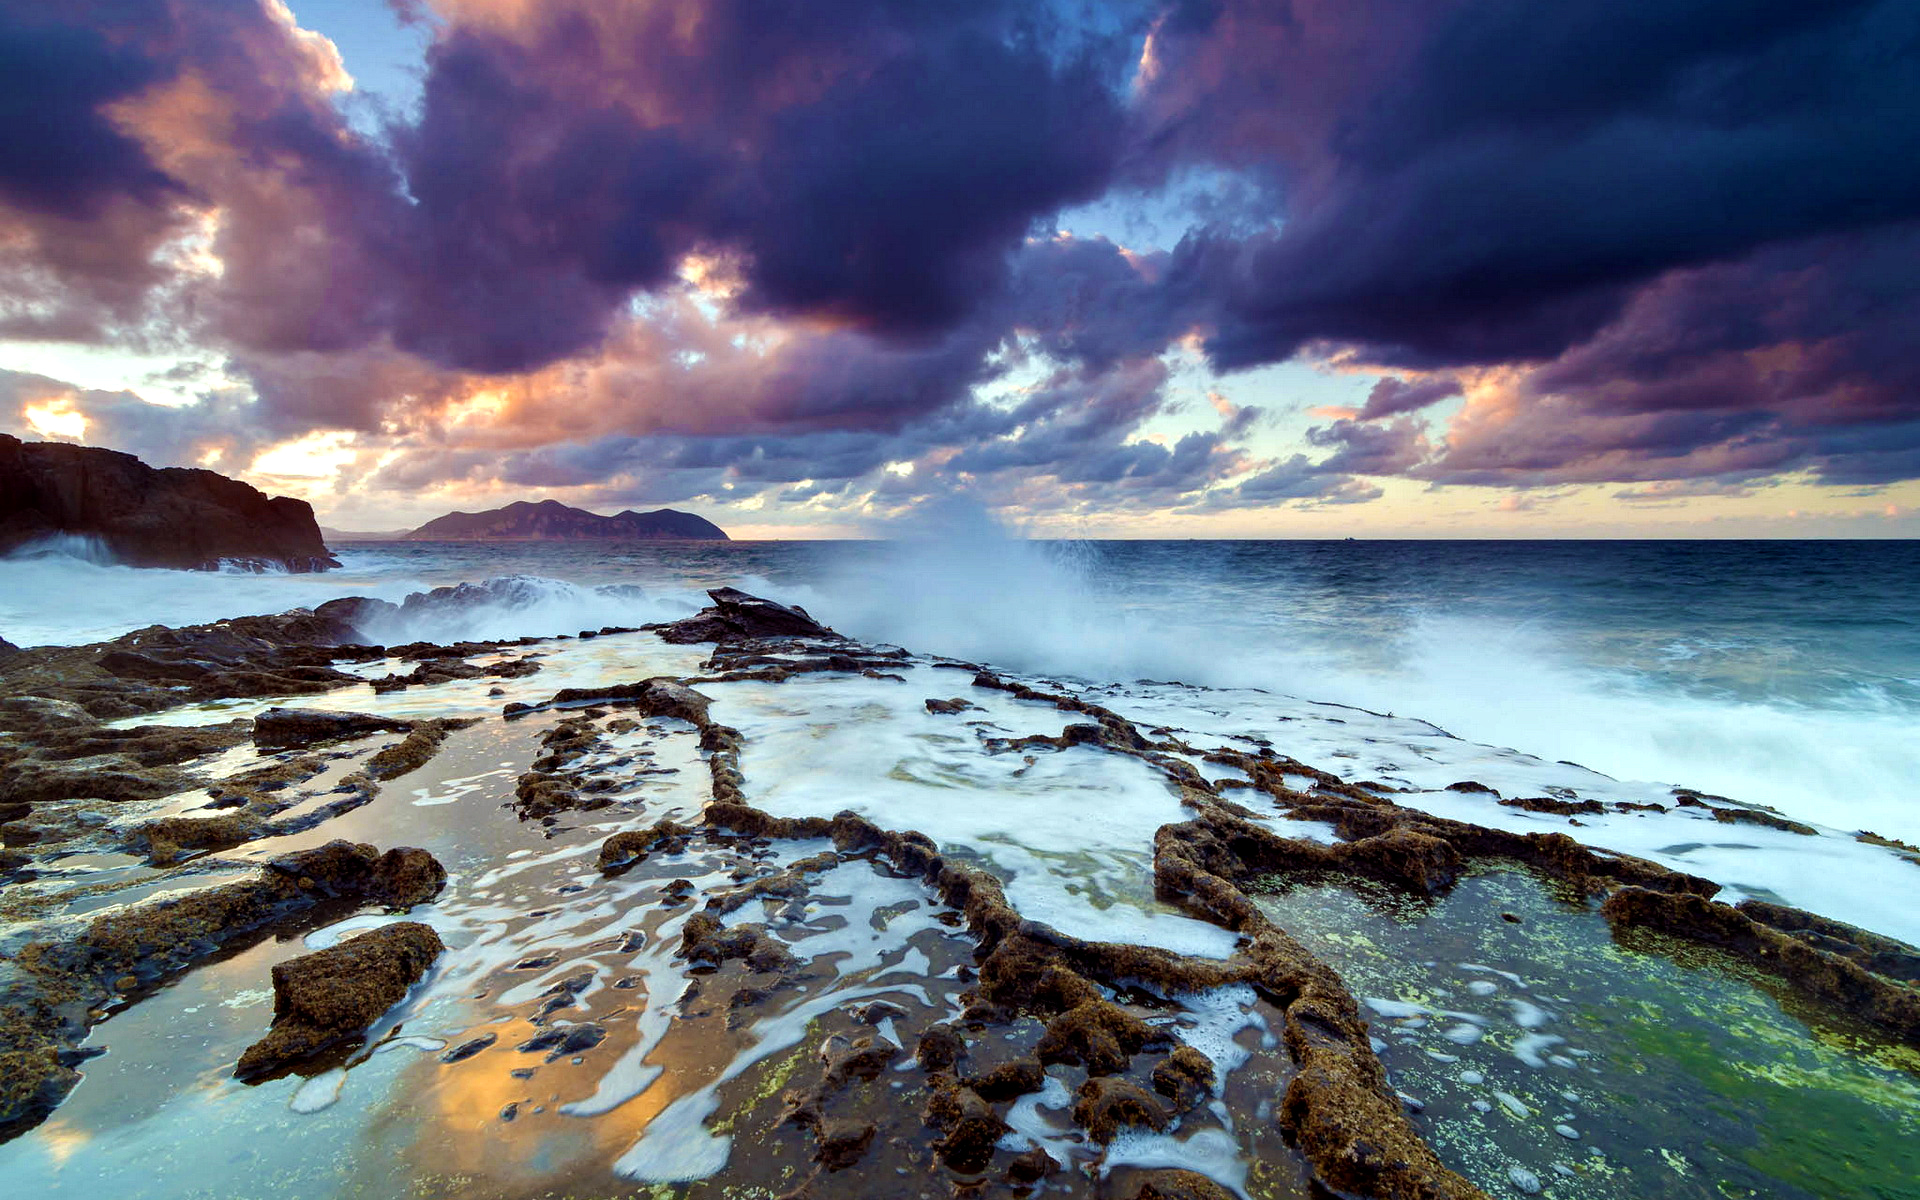 Related For Stunning Seascape Wallpaper. Stunning Seascape